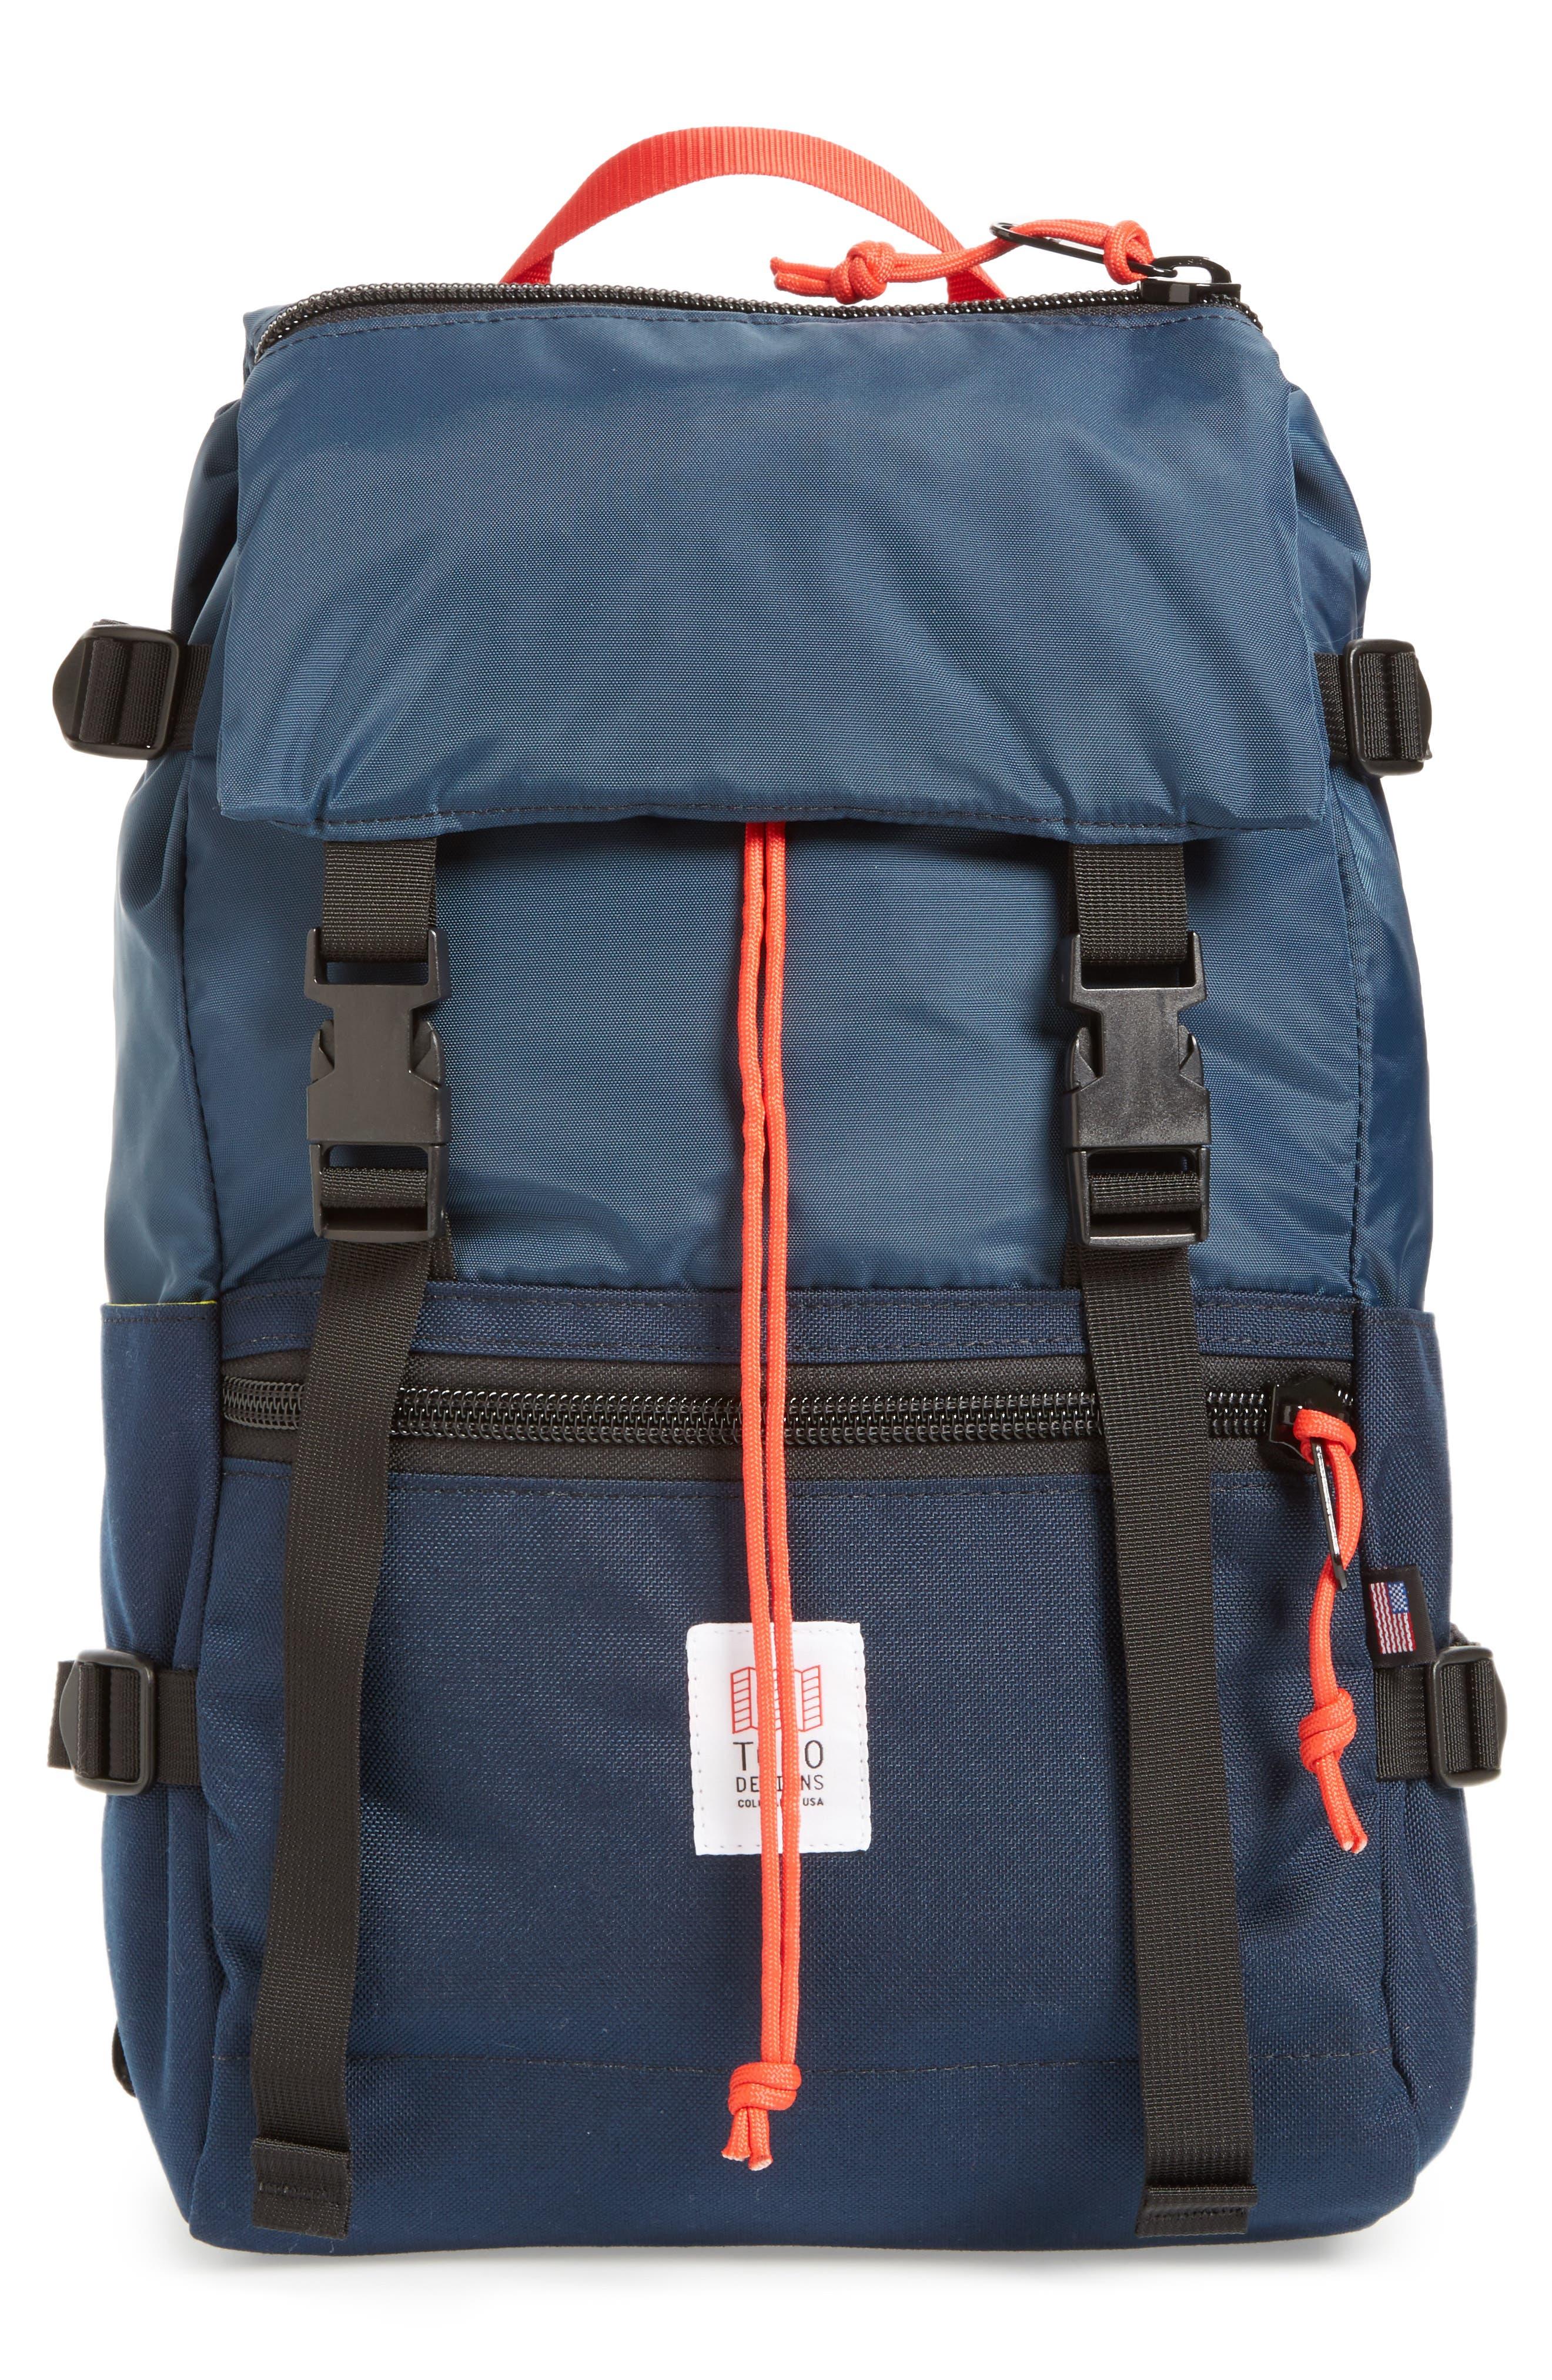 Rover Backpack,                             Main thumbnail 1, color,                             NAVY